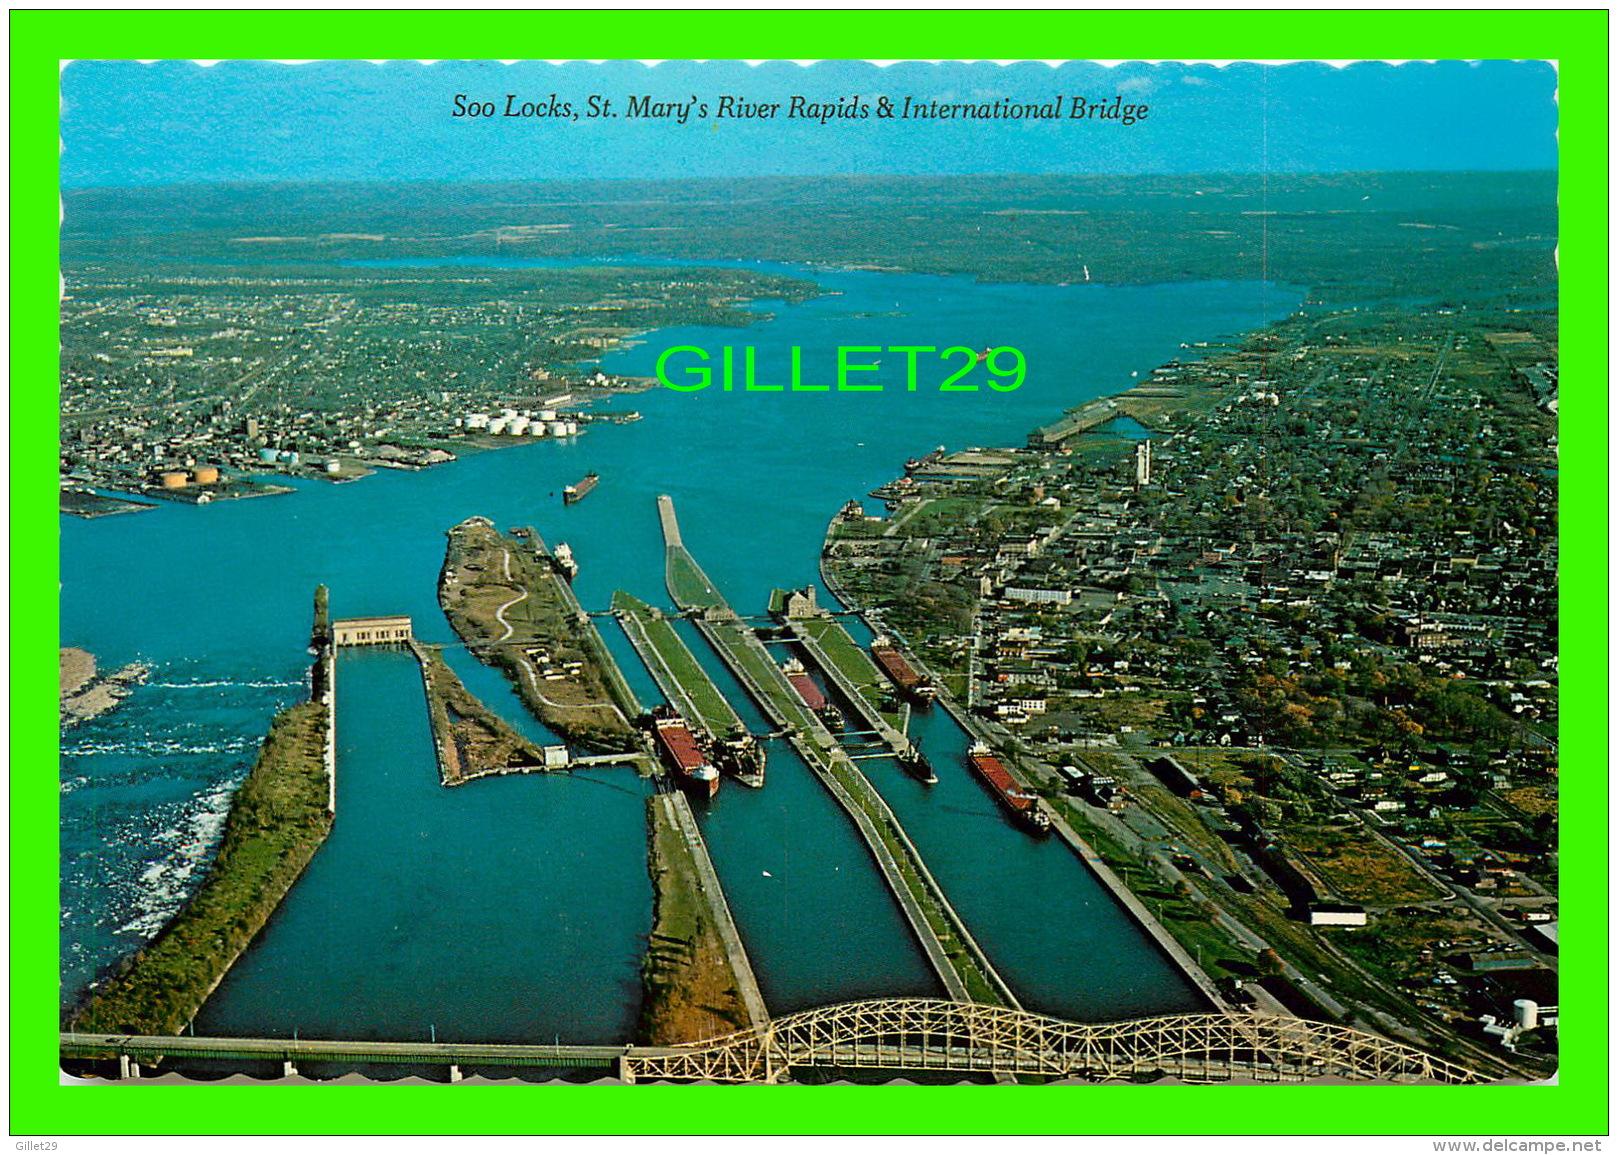 SAULT STE MARIE, ONTARIO - LOCKS ST MARY'S RIVER RAPIDS & THE INTERNATIONAL BRIDGE - SUPERIOR SOUVENIR WHOLESALE LTD - Ontario